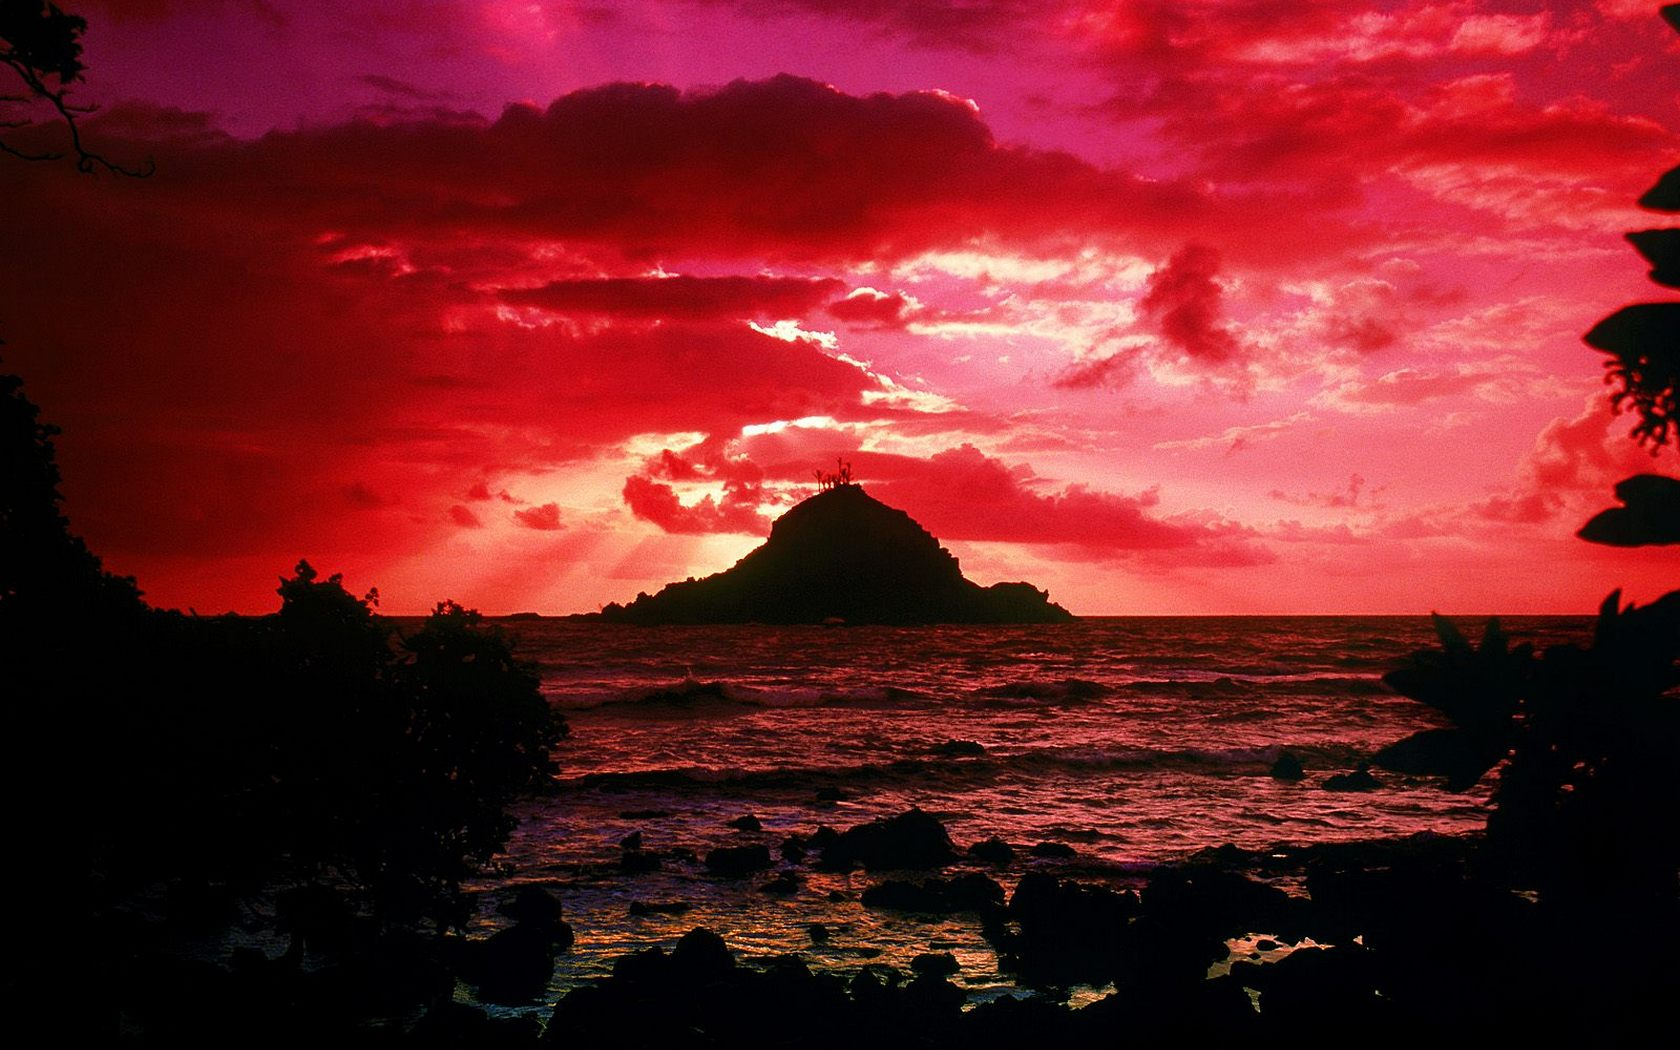 Download High quality Alau Island Maui Hawaii Sunset Wallpaper 1680x1050